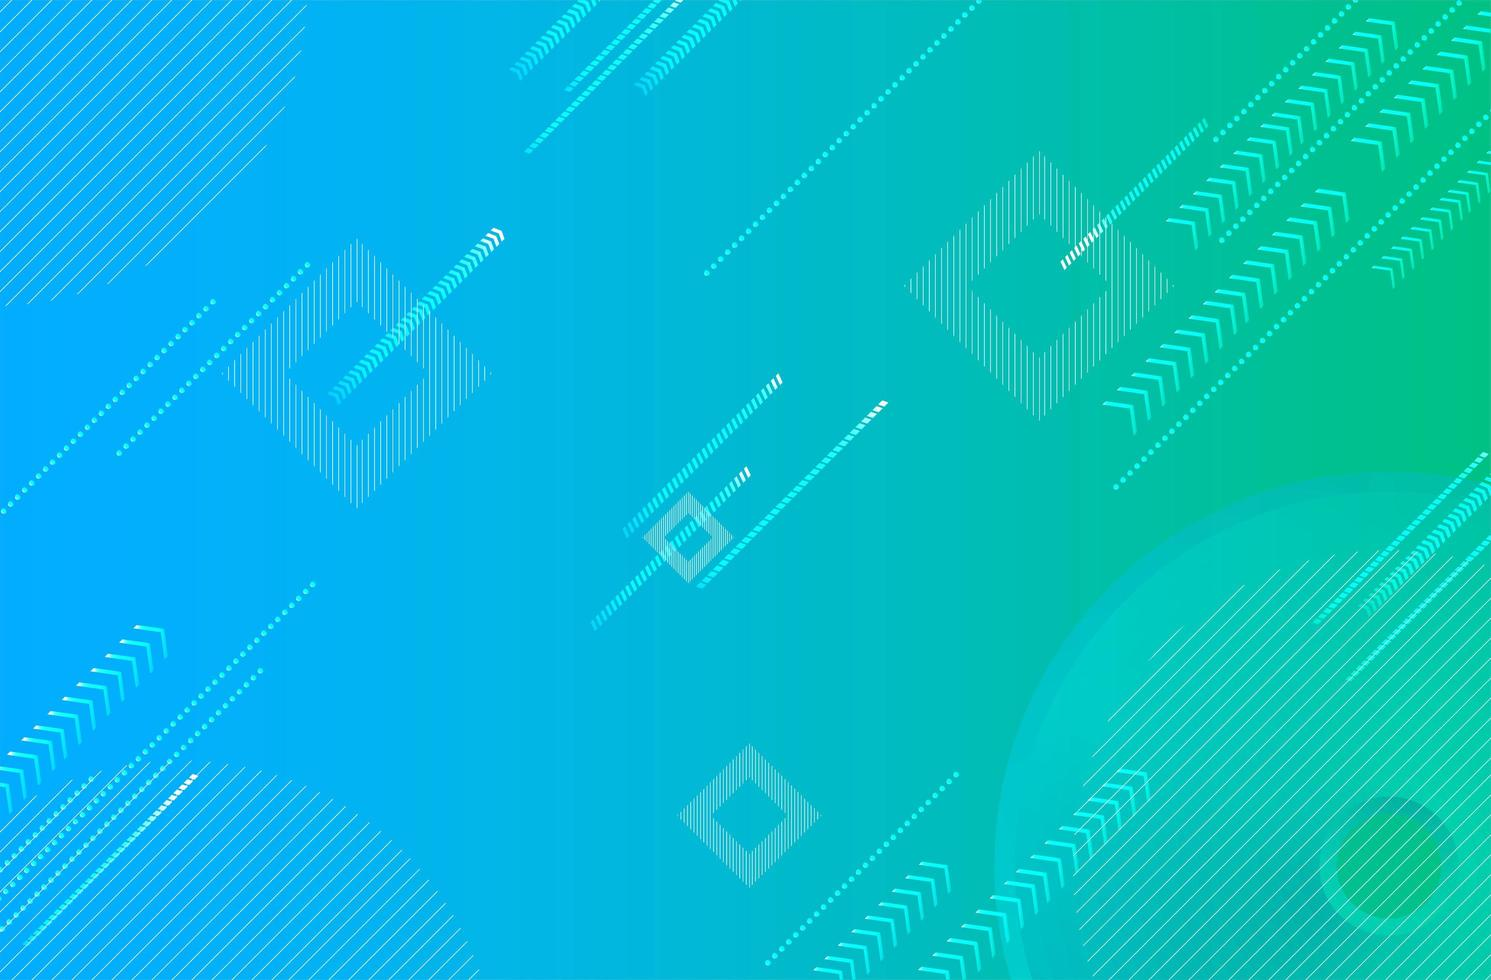 abstracte blauwgroene gradiënt digitale achtergrond vector